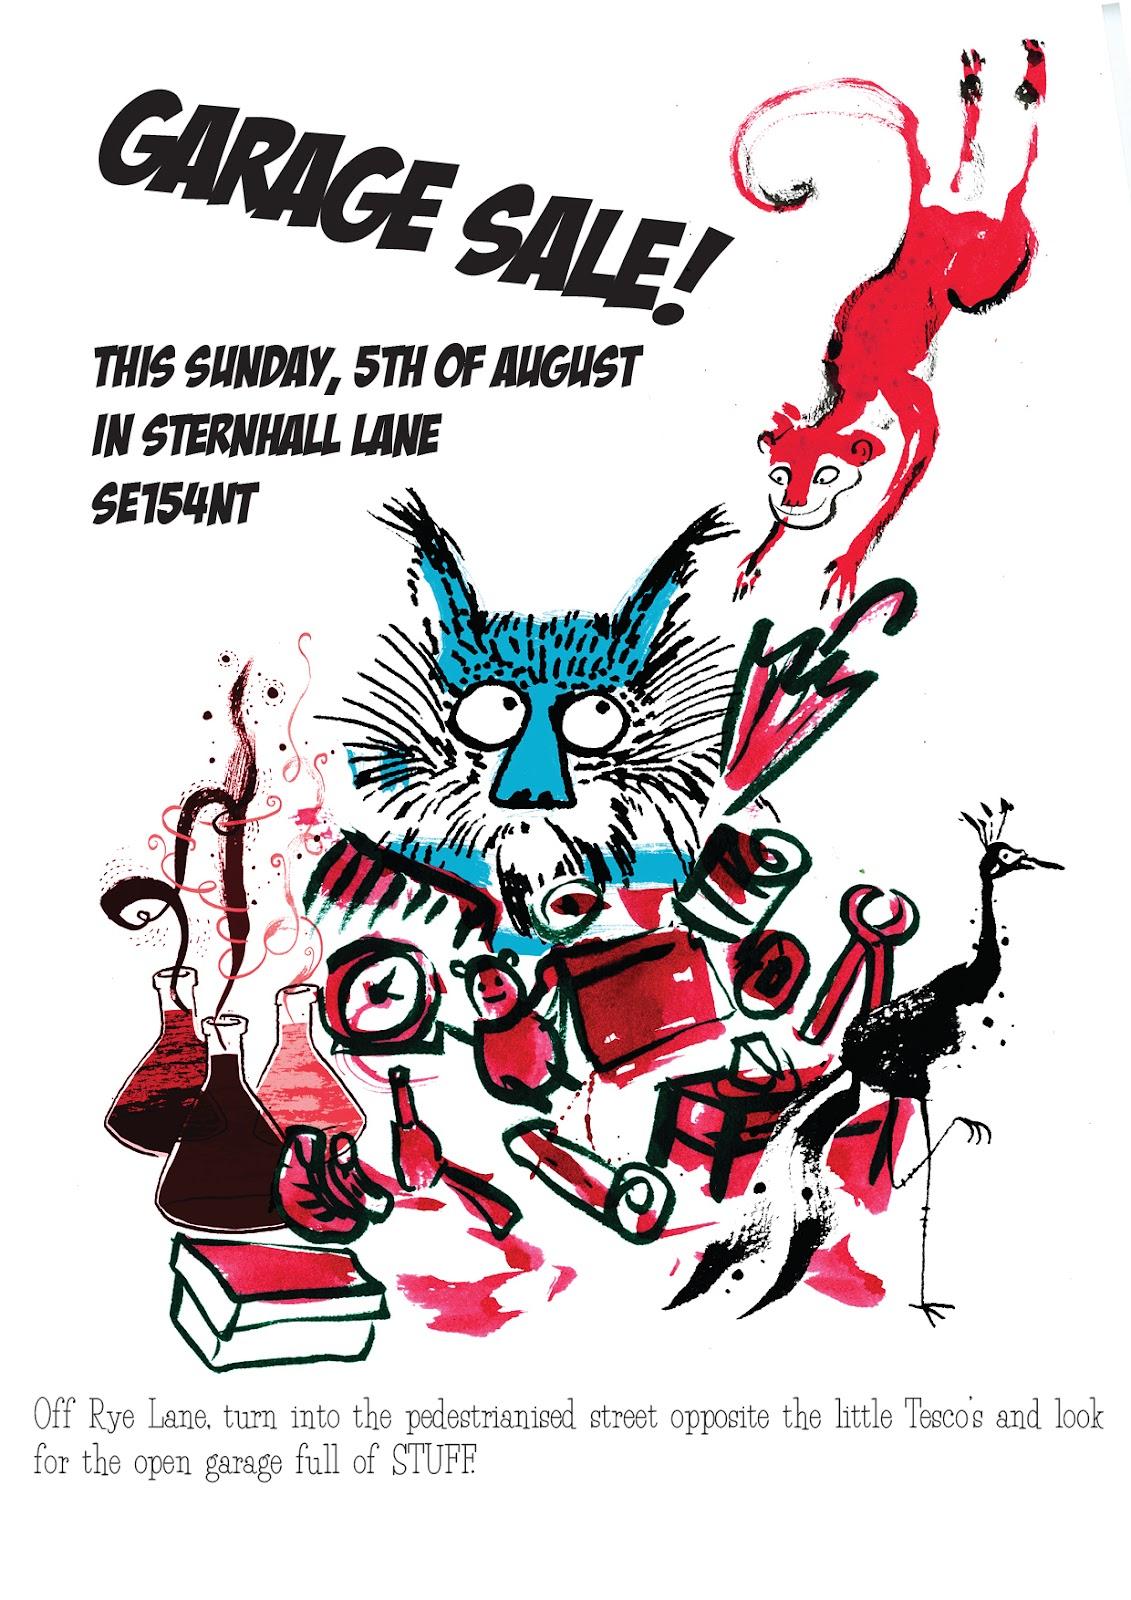 letters from schwarzville garage sale poster